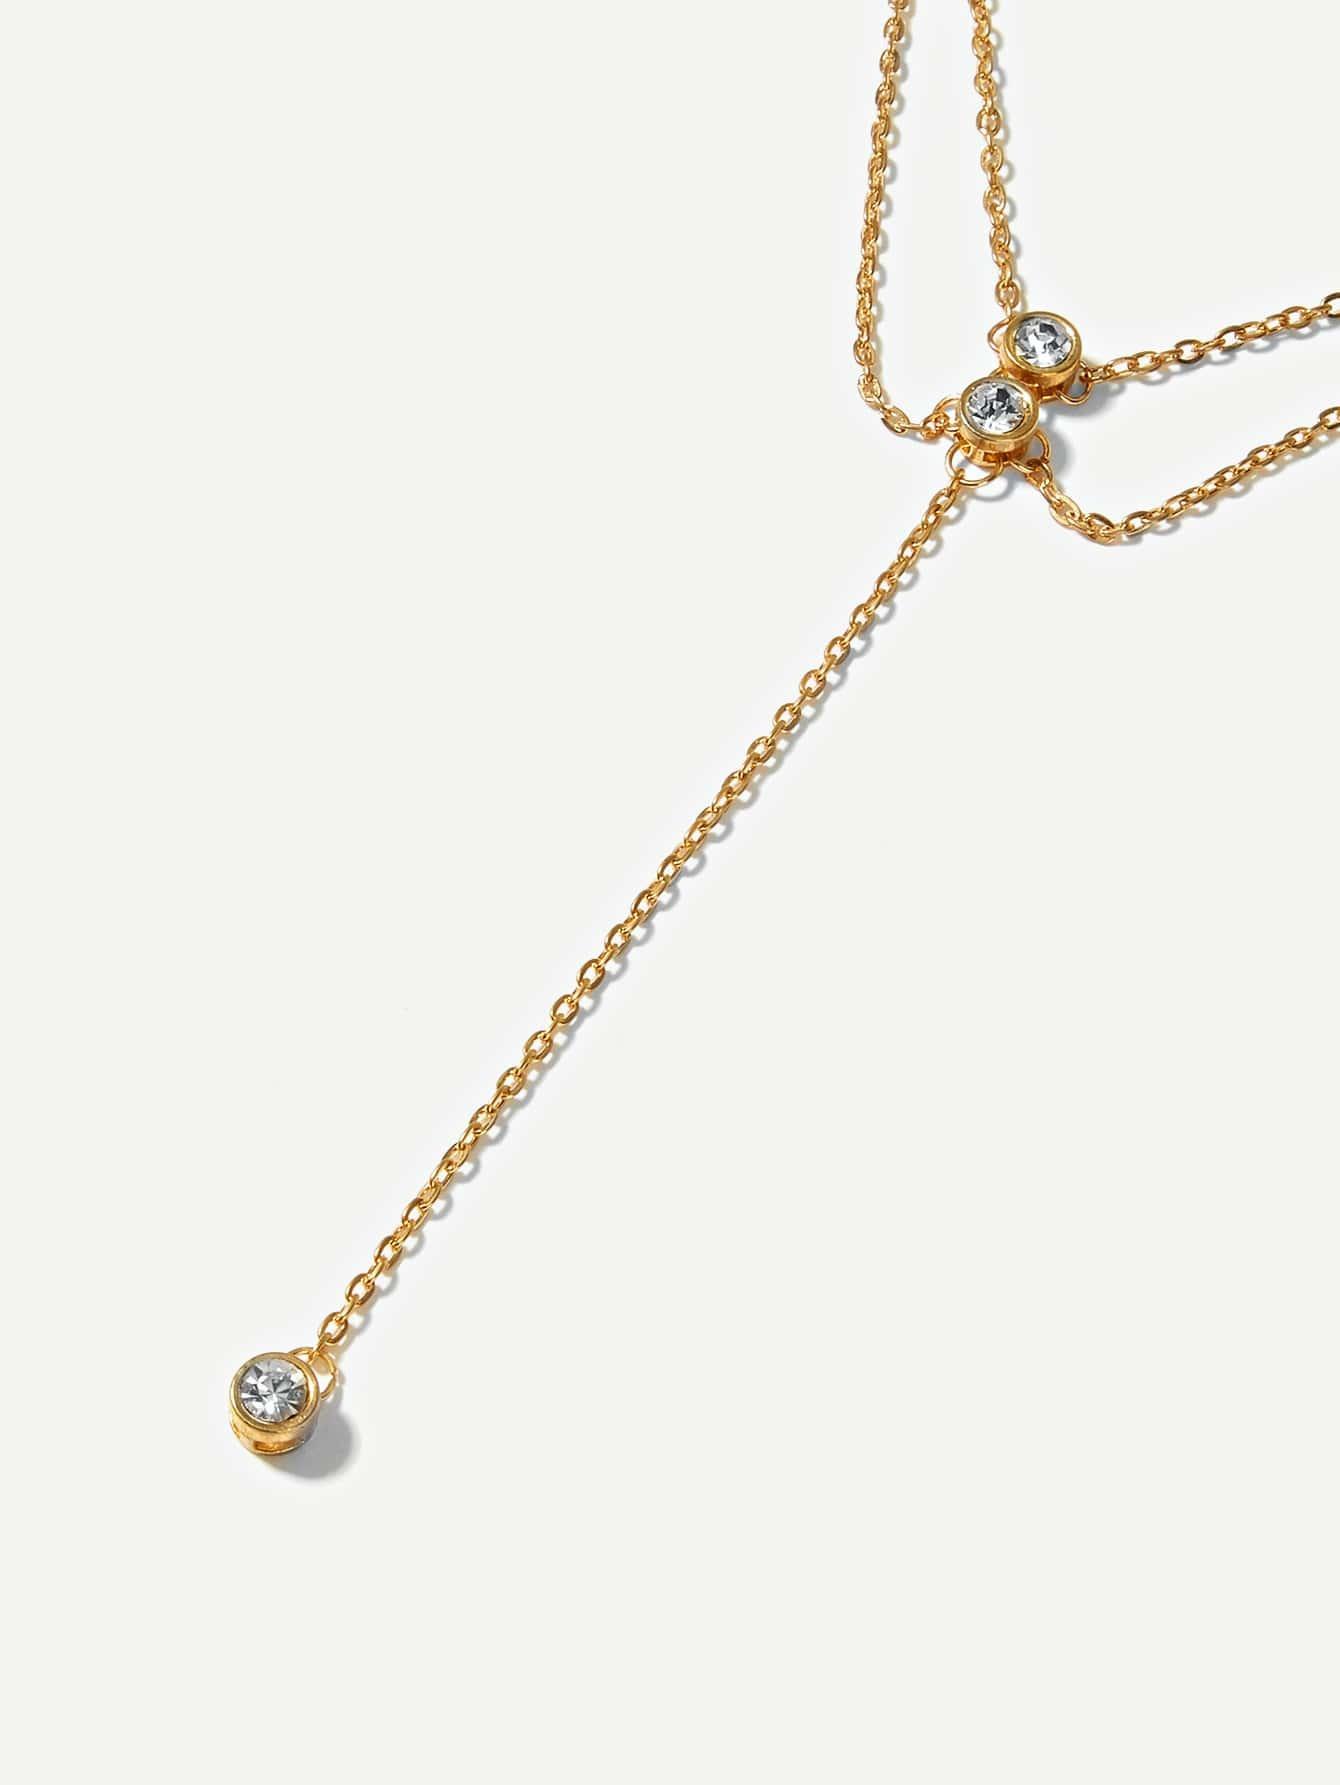 Rhinestone Panel Layered Chain Necklace